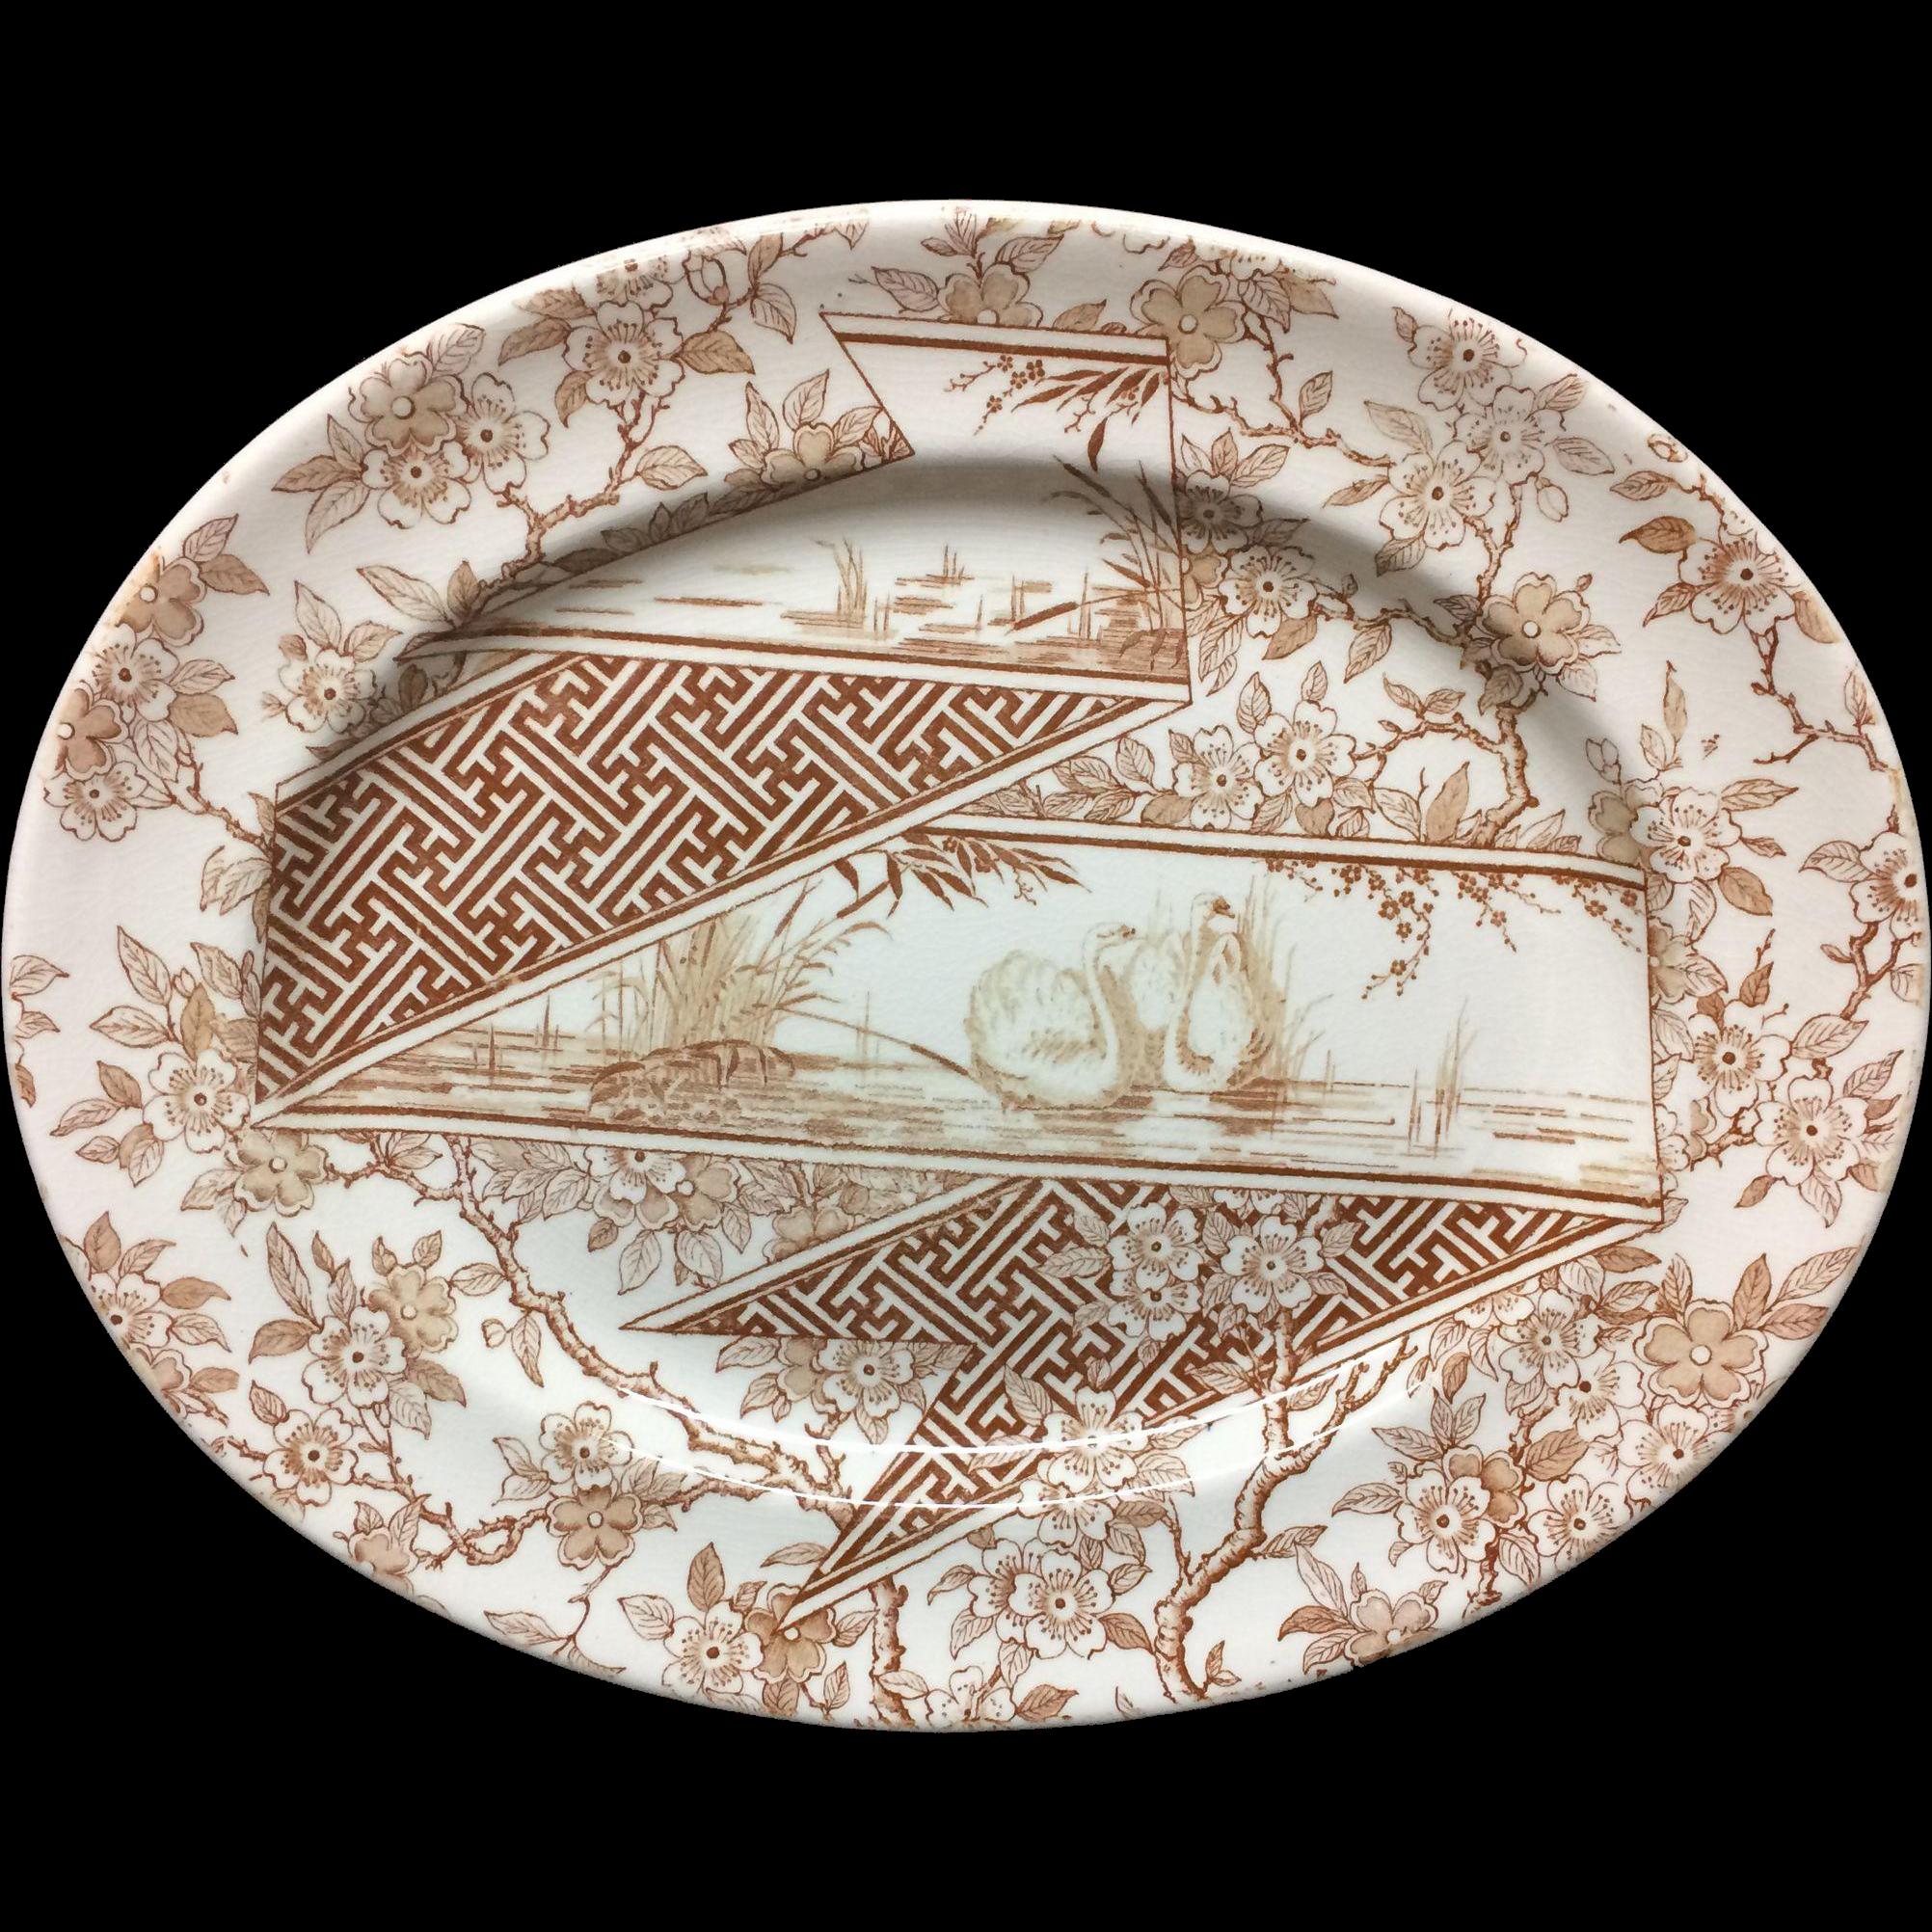 Rare Brown Aesthetic Transferware Platter ~ Doulton SWANS 1888